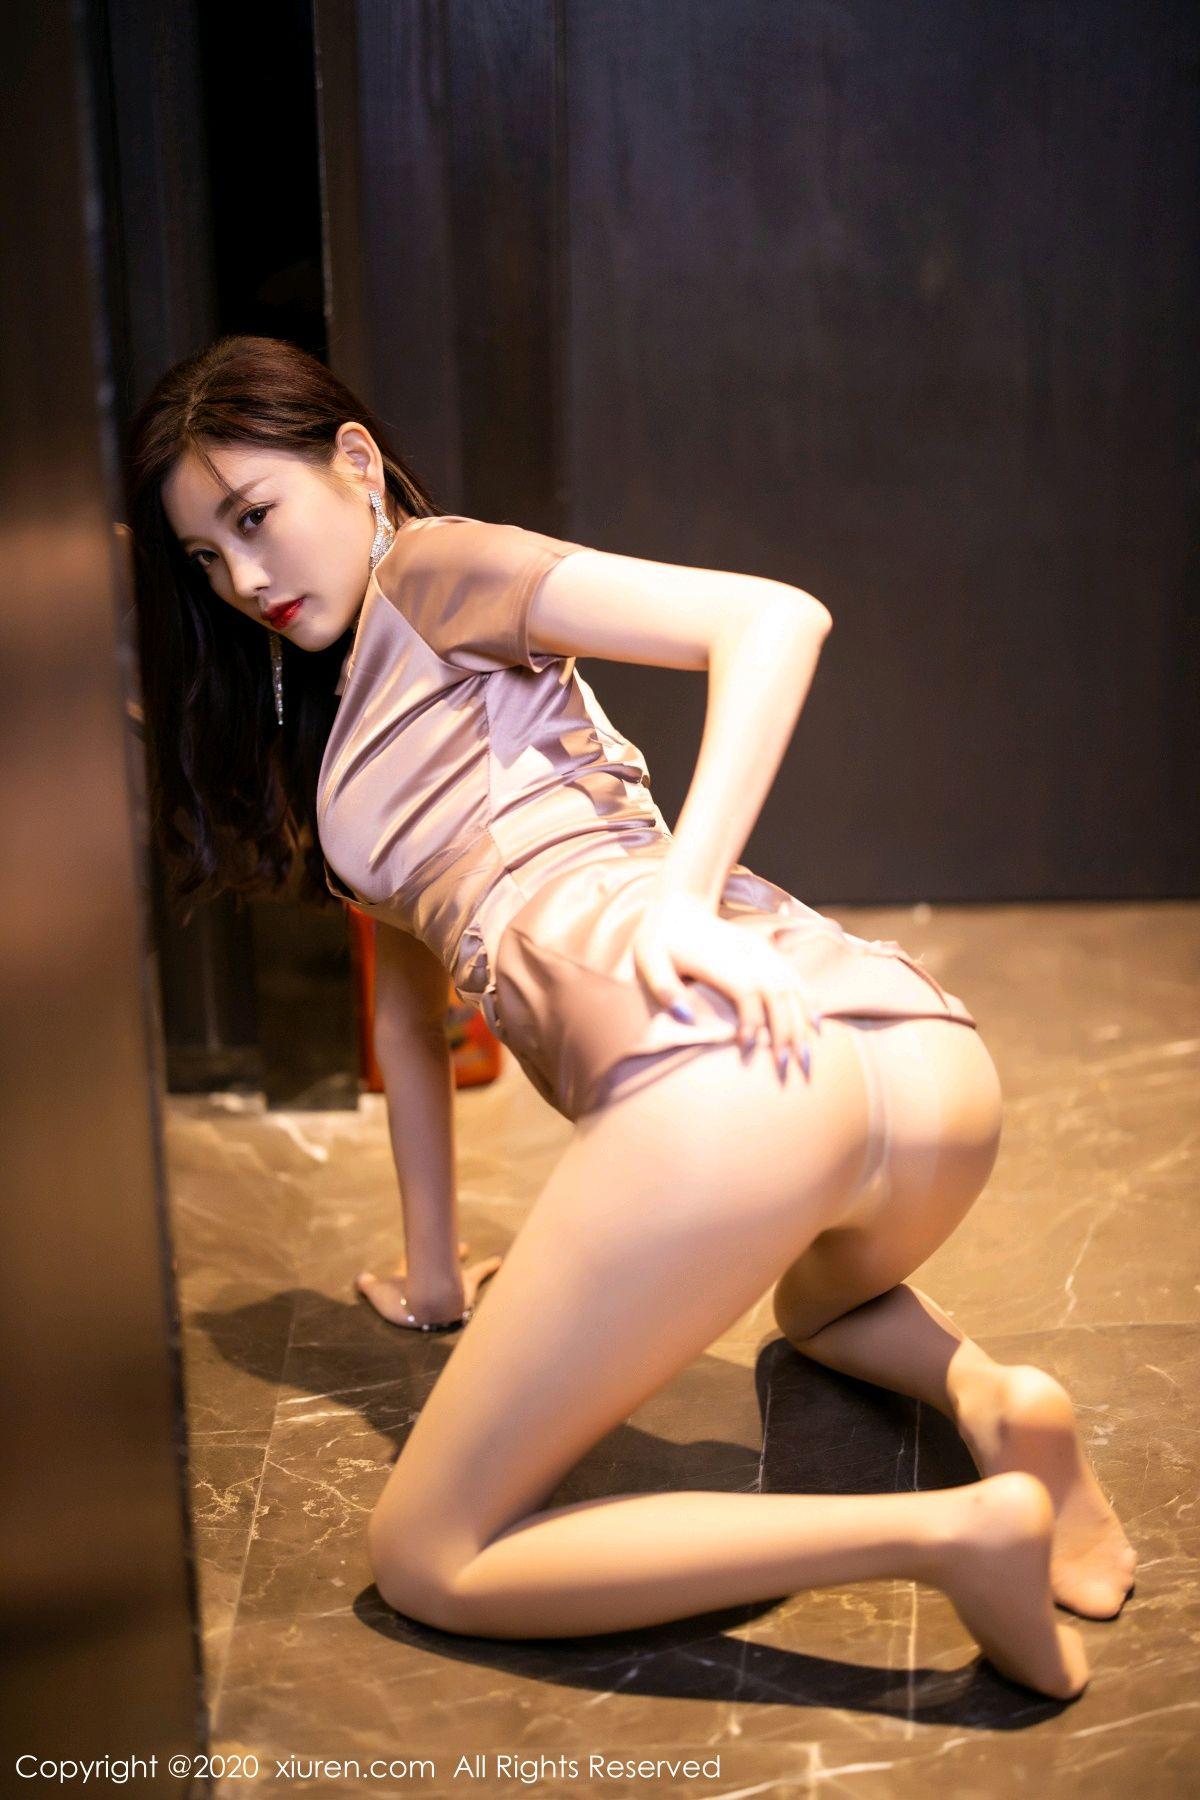 [XiuRen] Vol.2587 Yang Chen Chen 71P, Underwear, Xiuren, Yang Chen Chen